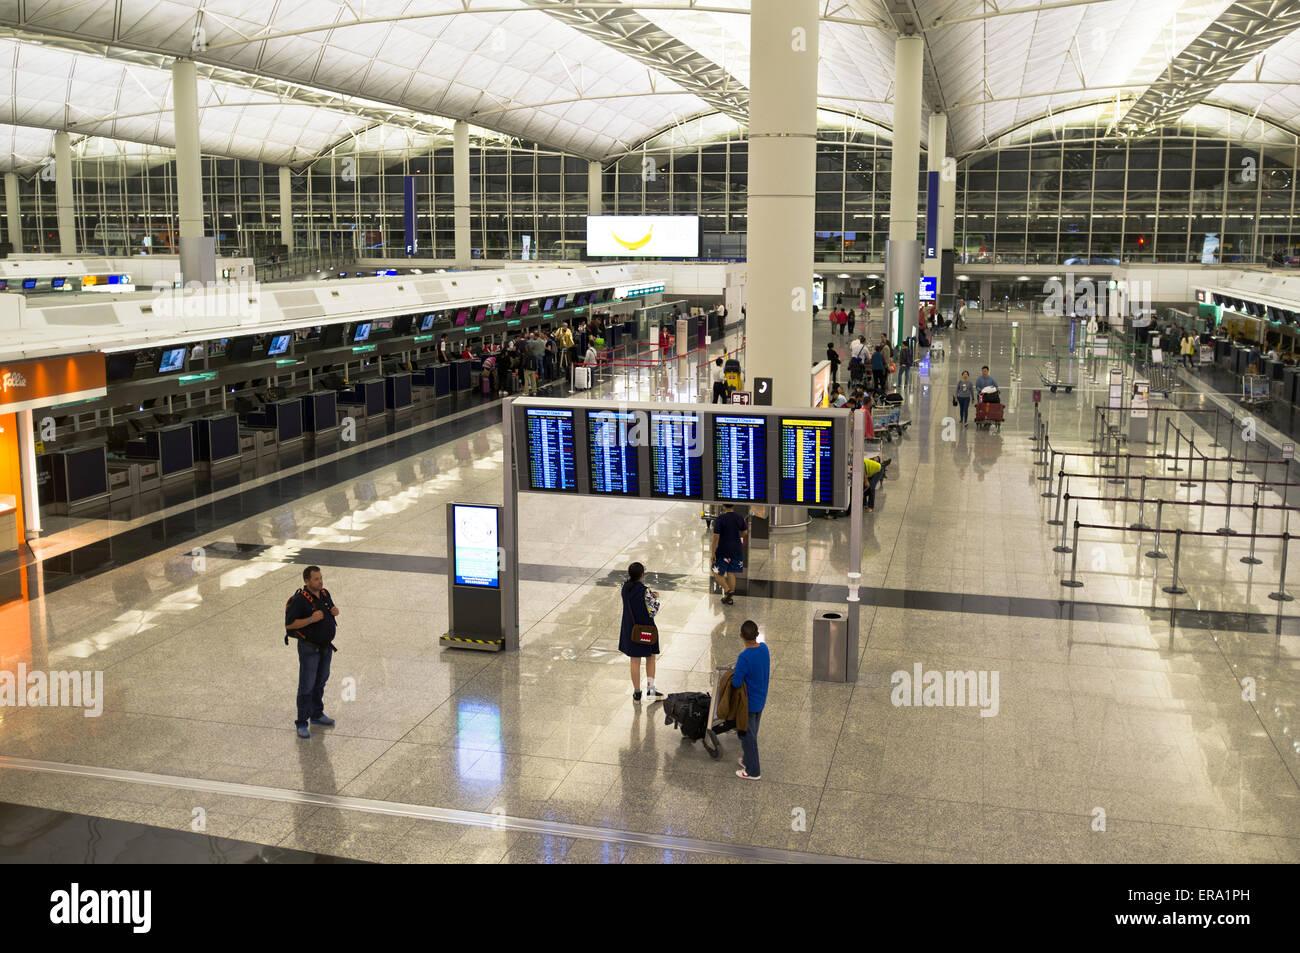 dh Hong Kong airport CHEK LAP KOK HONG KONG Check in desk departure board - Stock Image